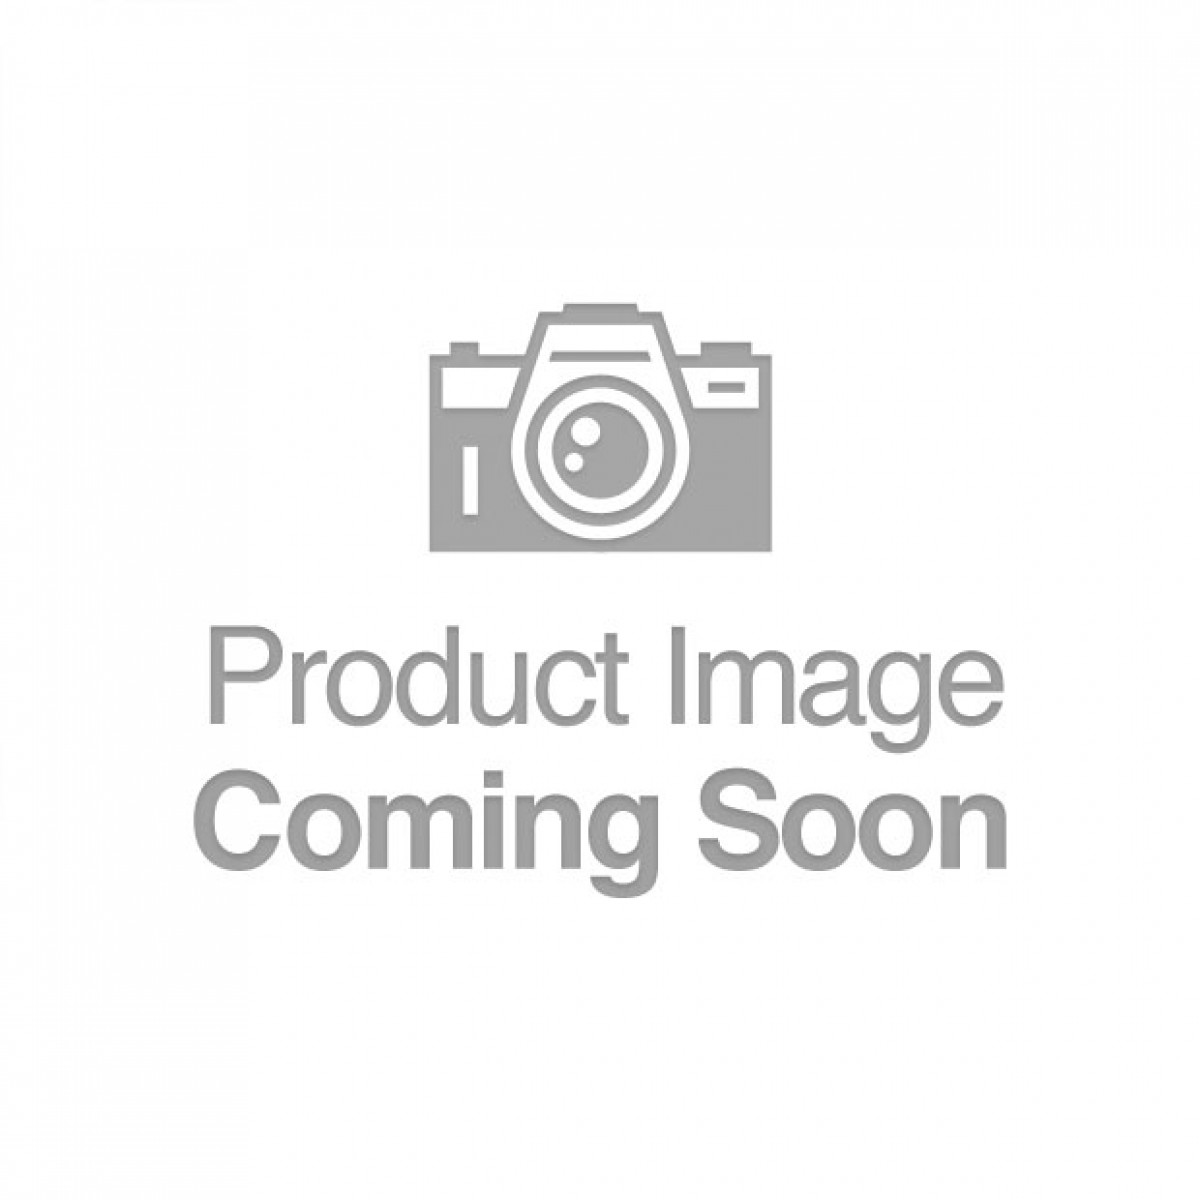 Signature Strokers ULTRASKYN Pocket Pussy - Adria Allure